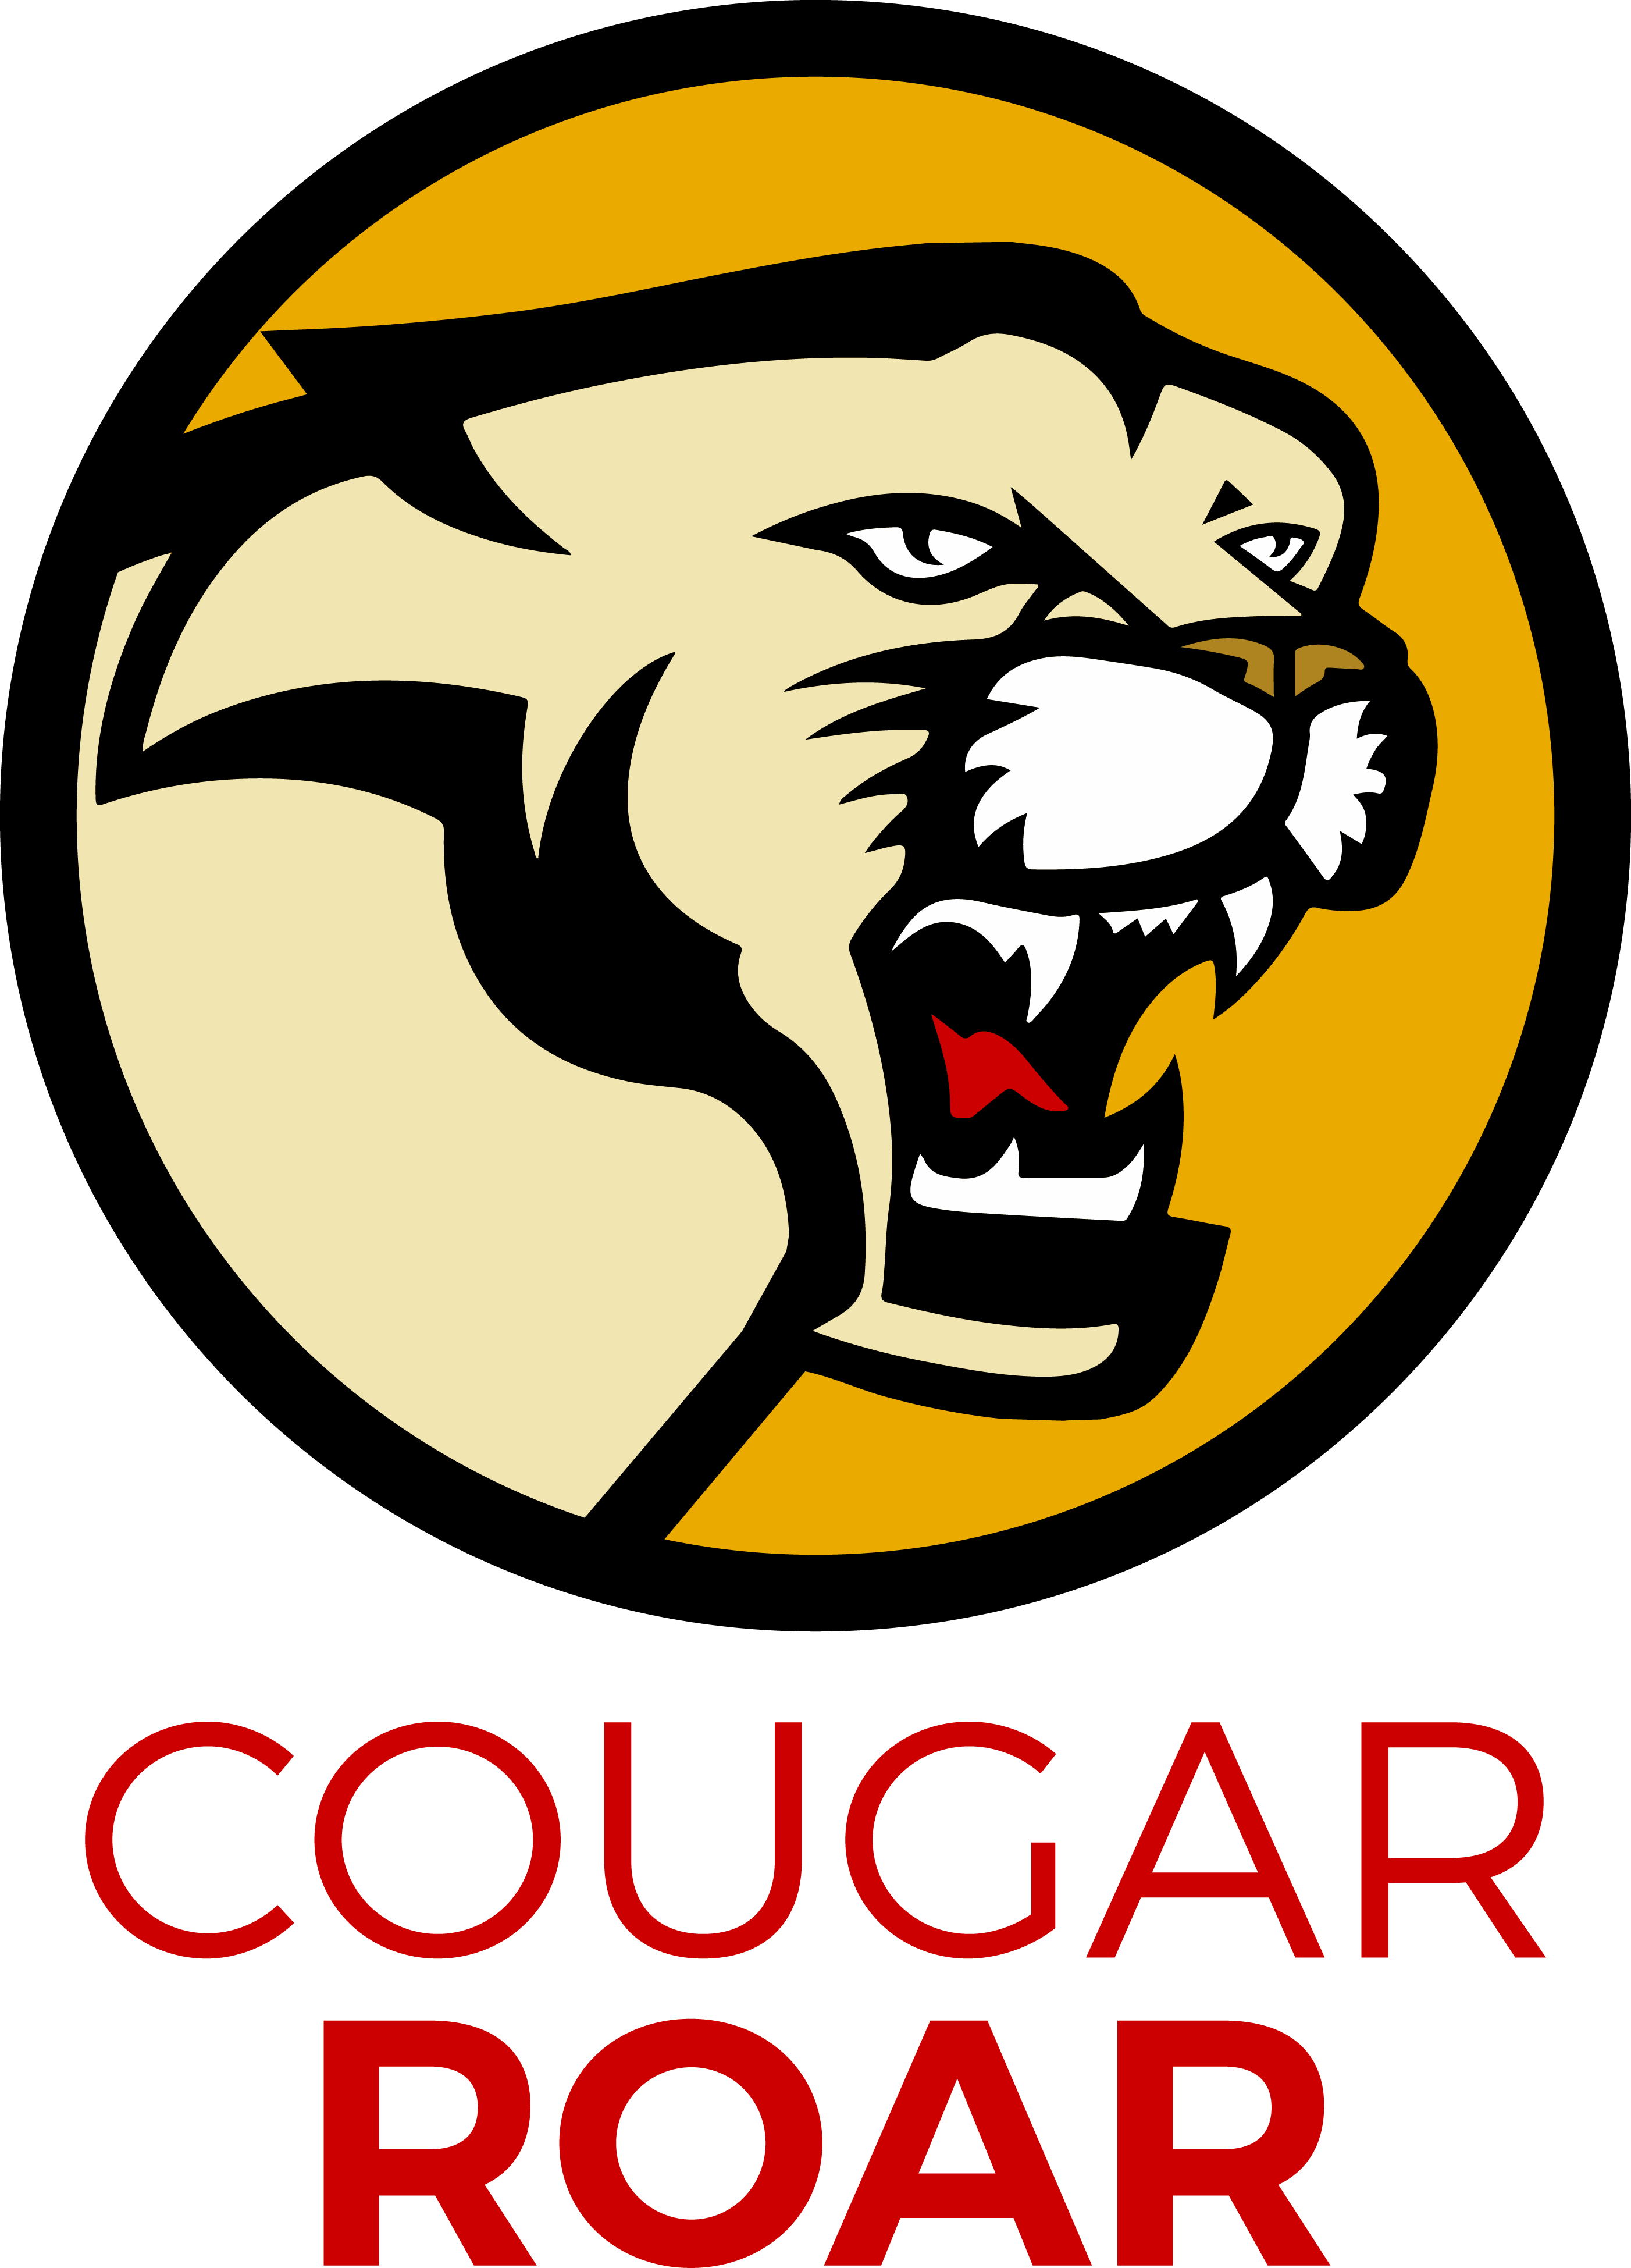 Cougar ROAR logo